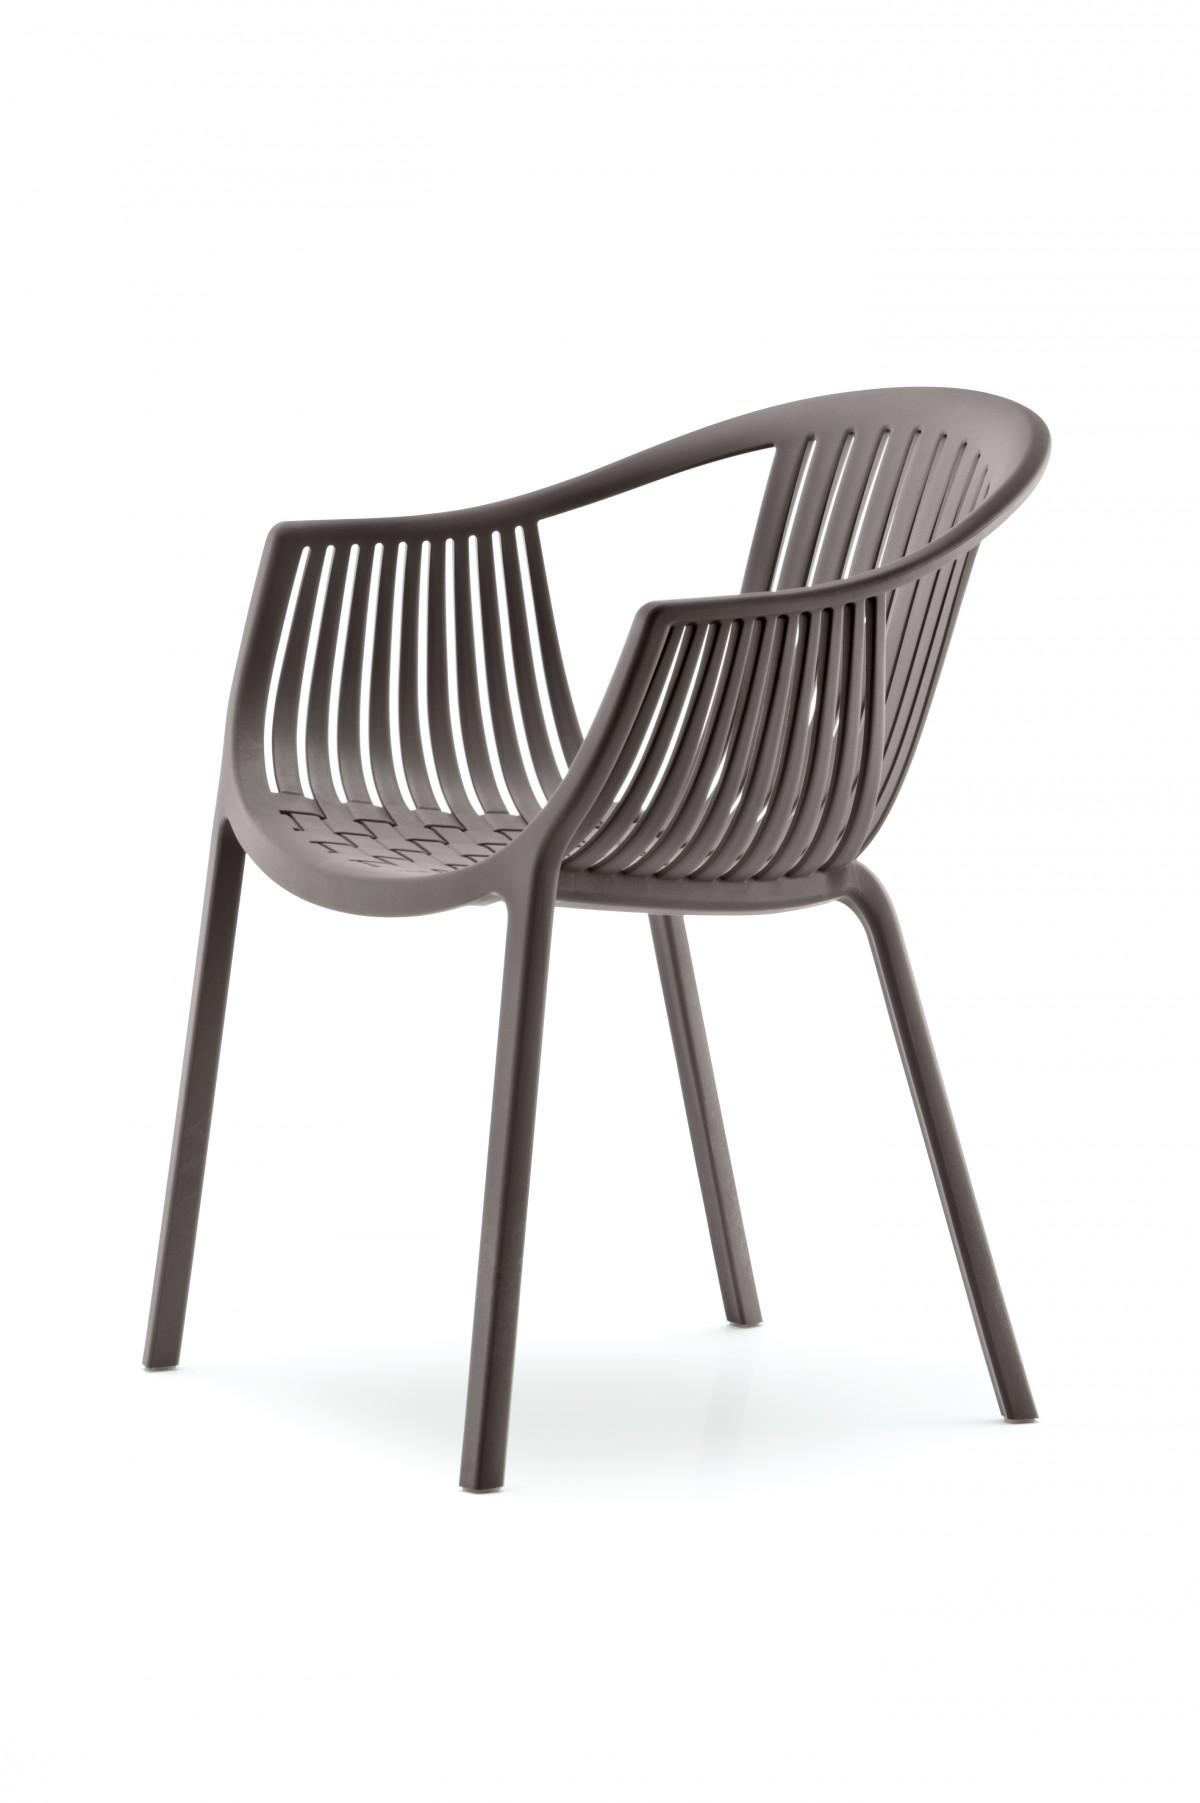 tatami 306 terrasmeubilair p m furniture horeca meubilair op maat en interieurs. Black Bedroom Furniture Sets. Home Design Ideas